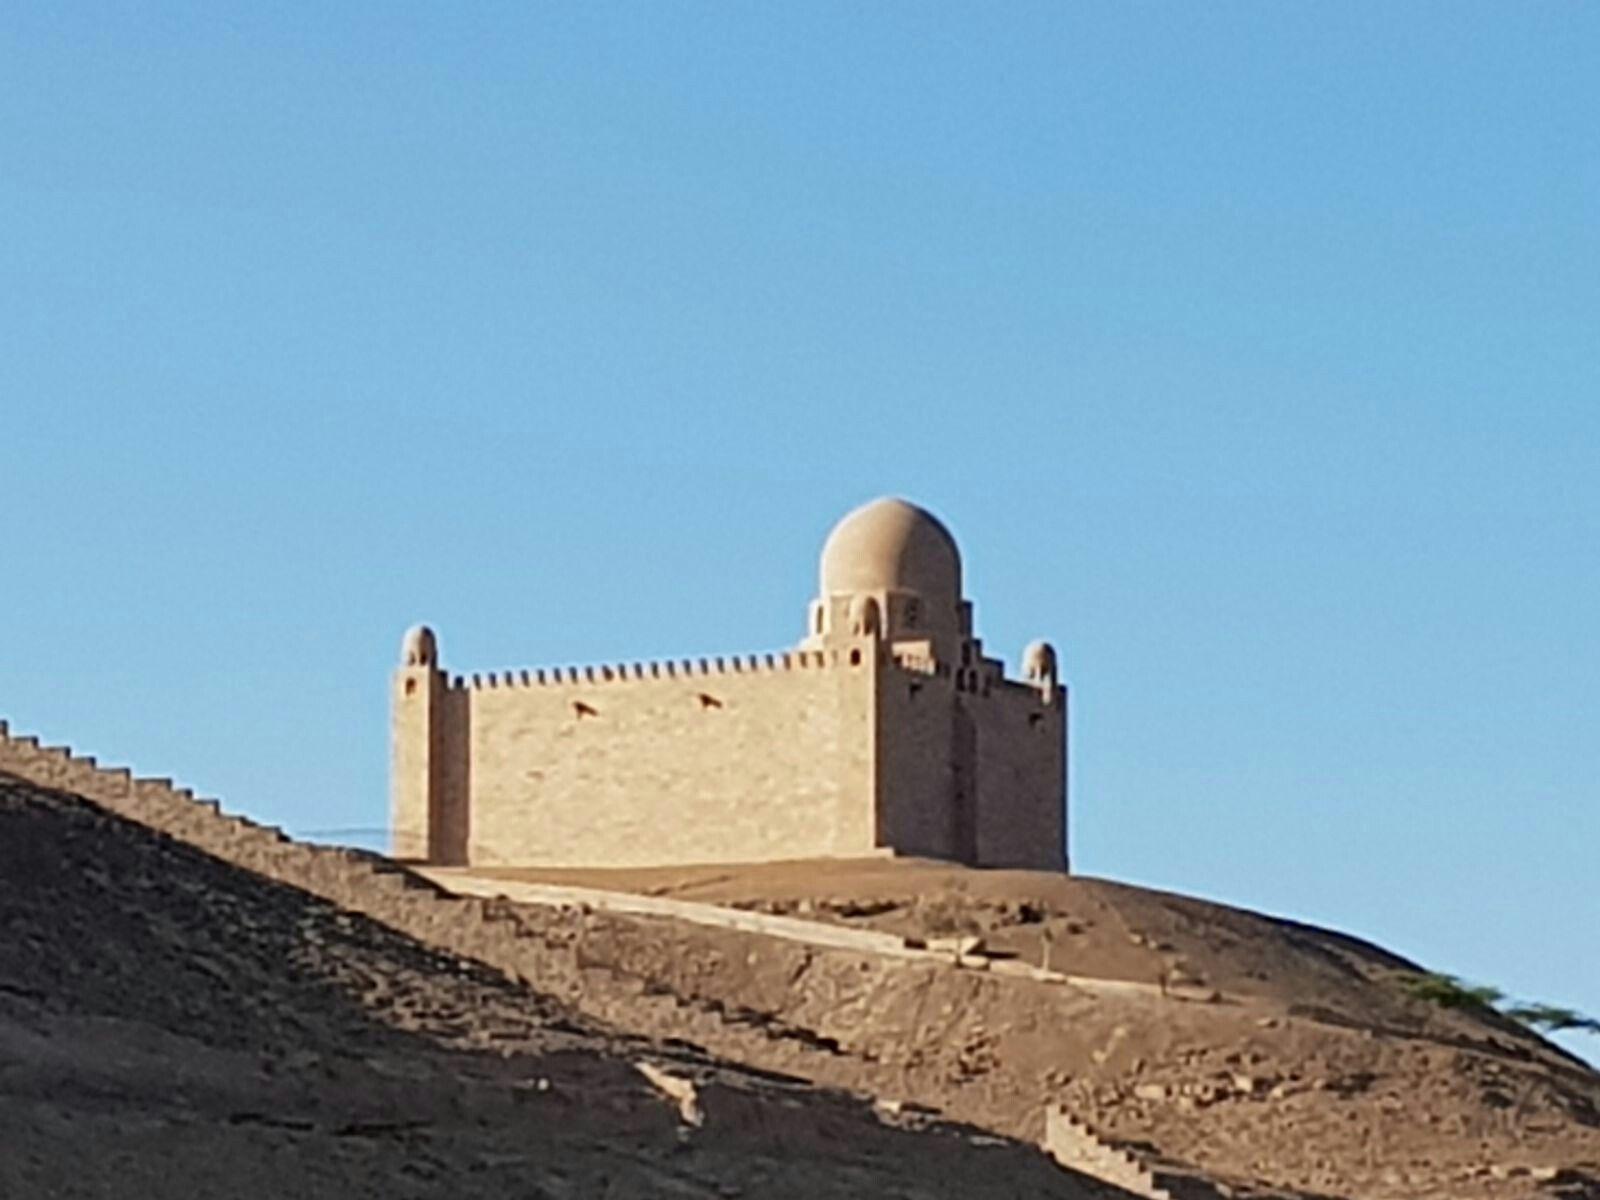 Tumba Aga Khan   Egypt   Pinterest   Aga